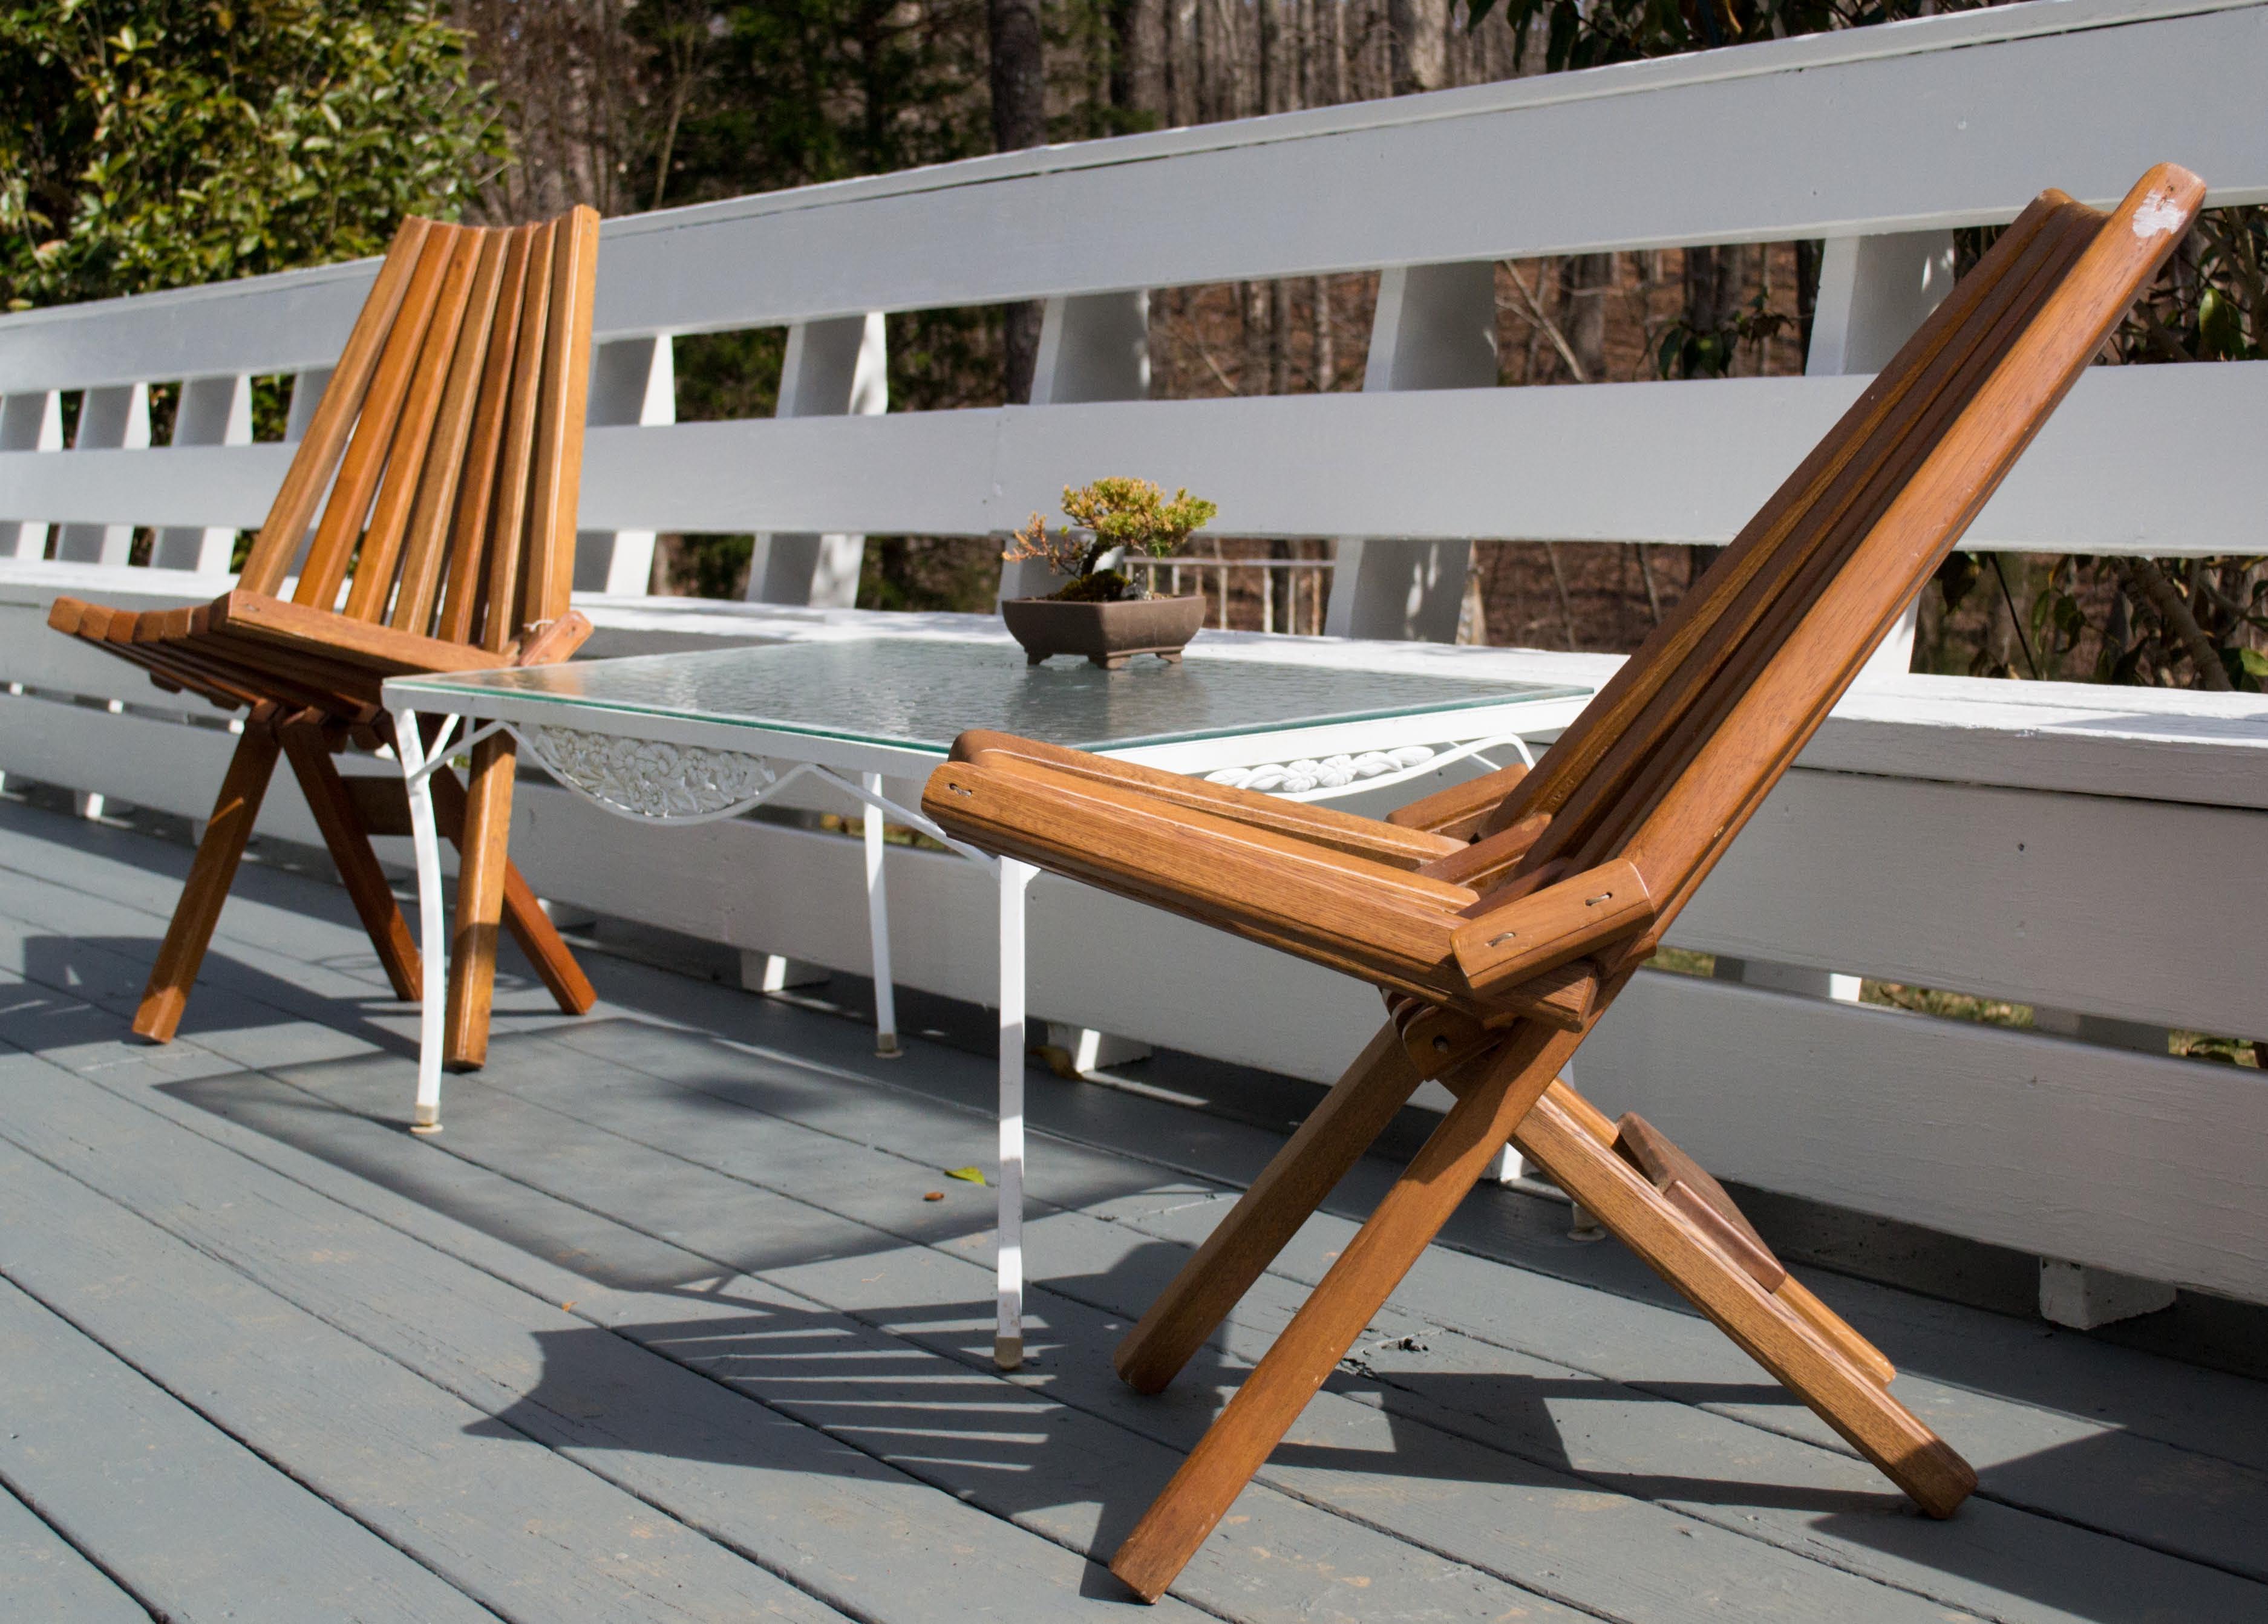 mcm panamerican deck chair